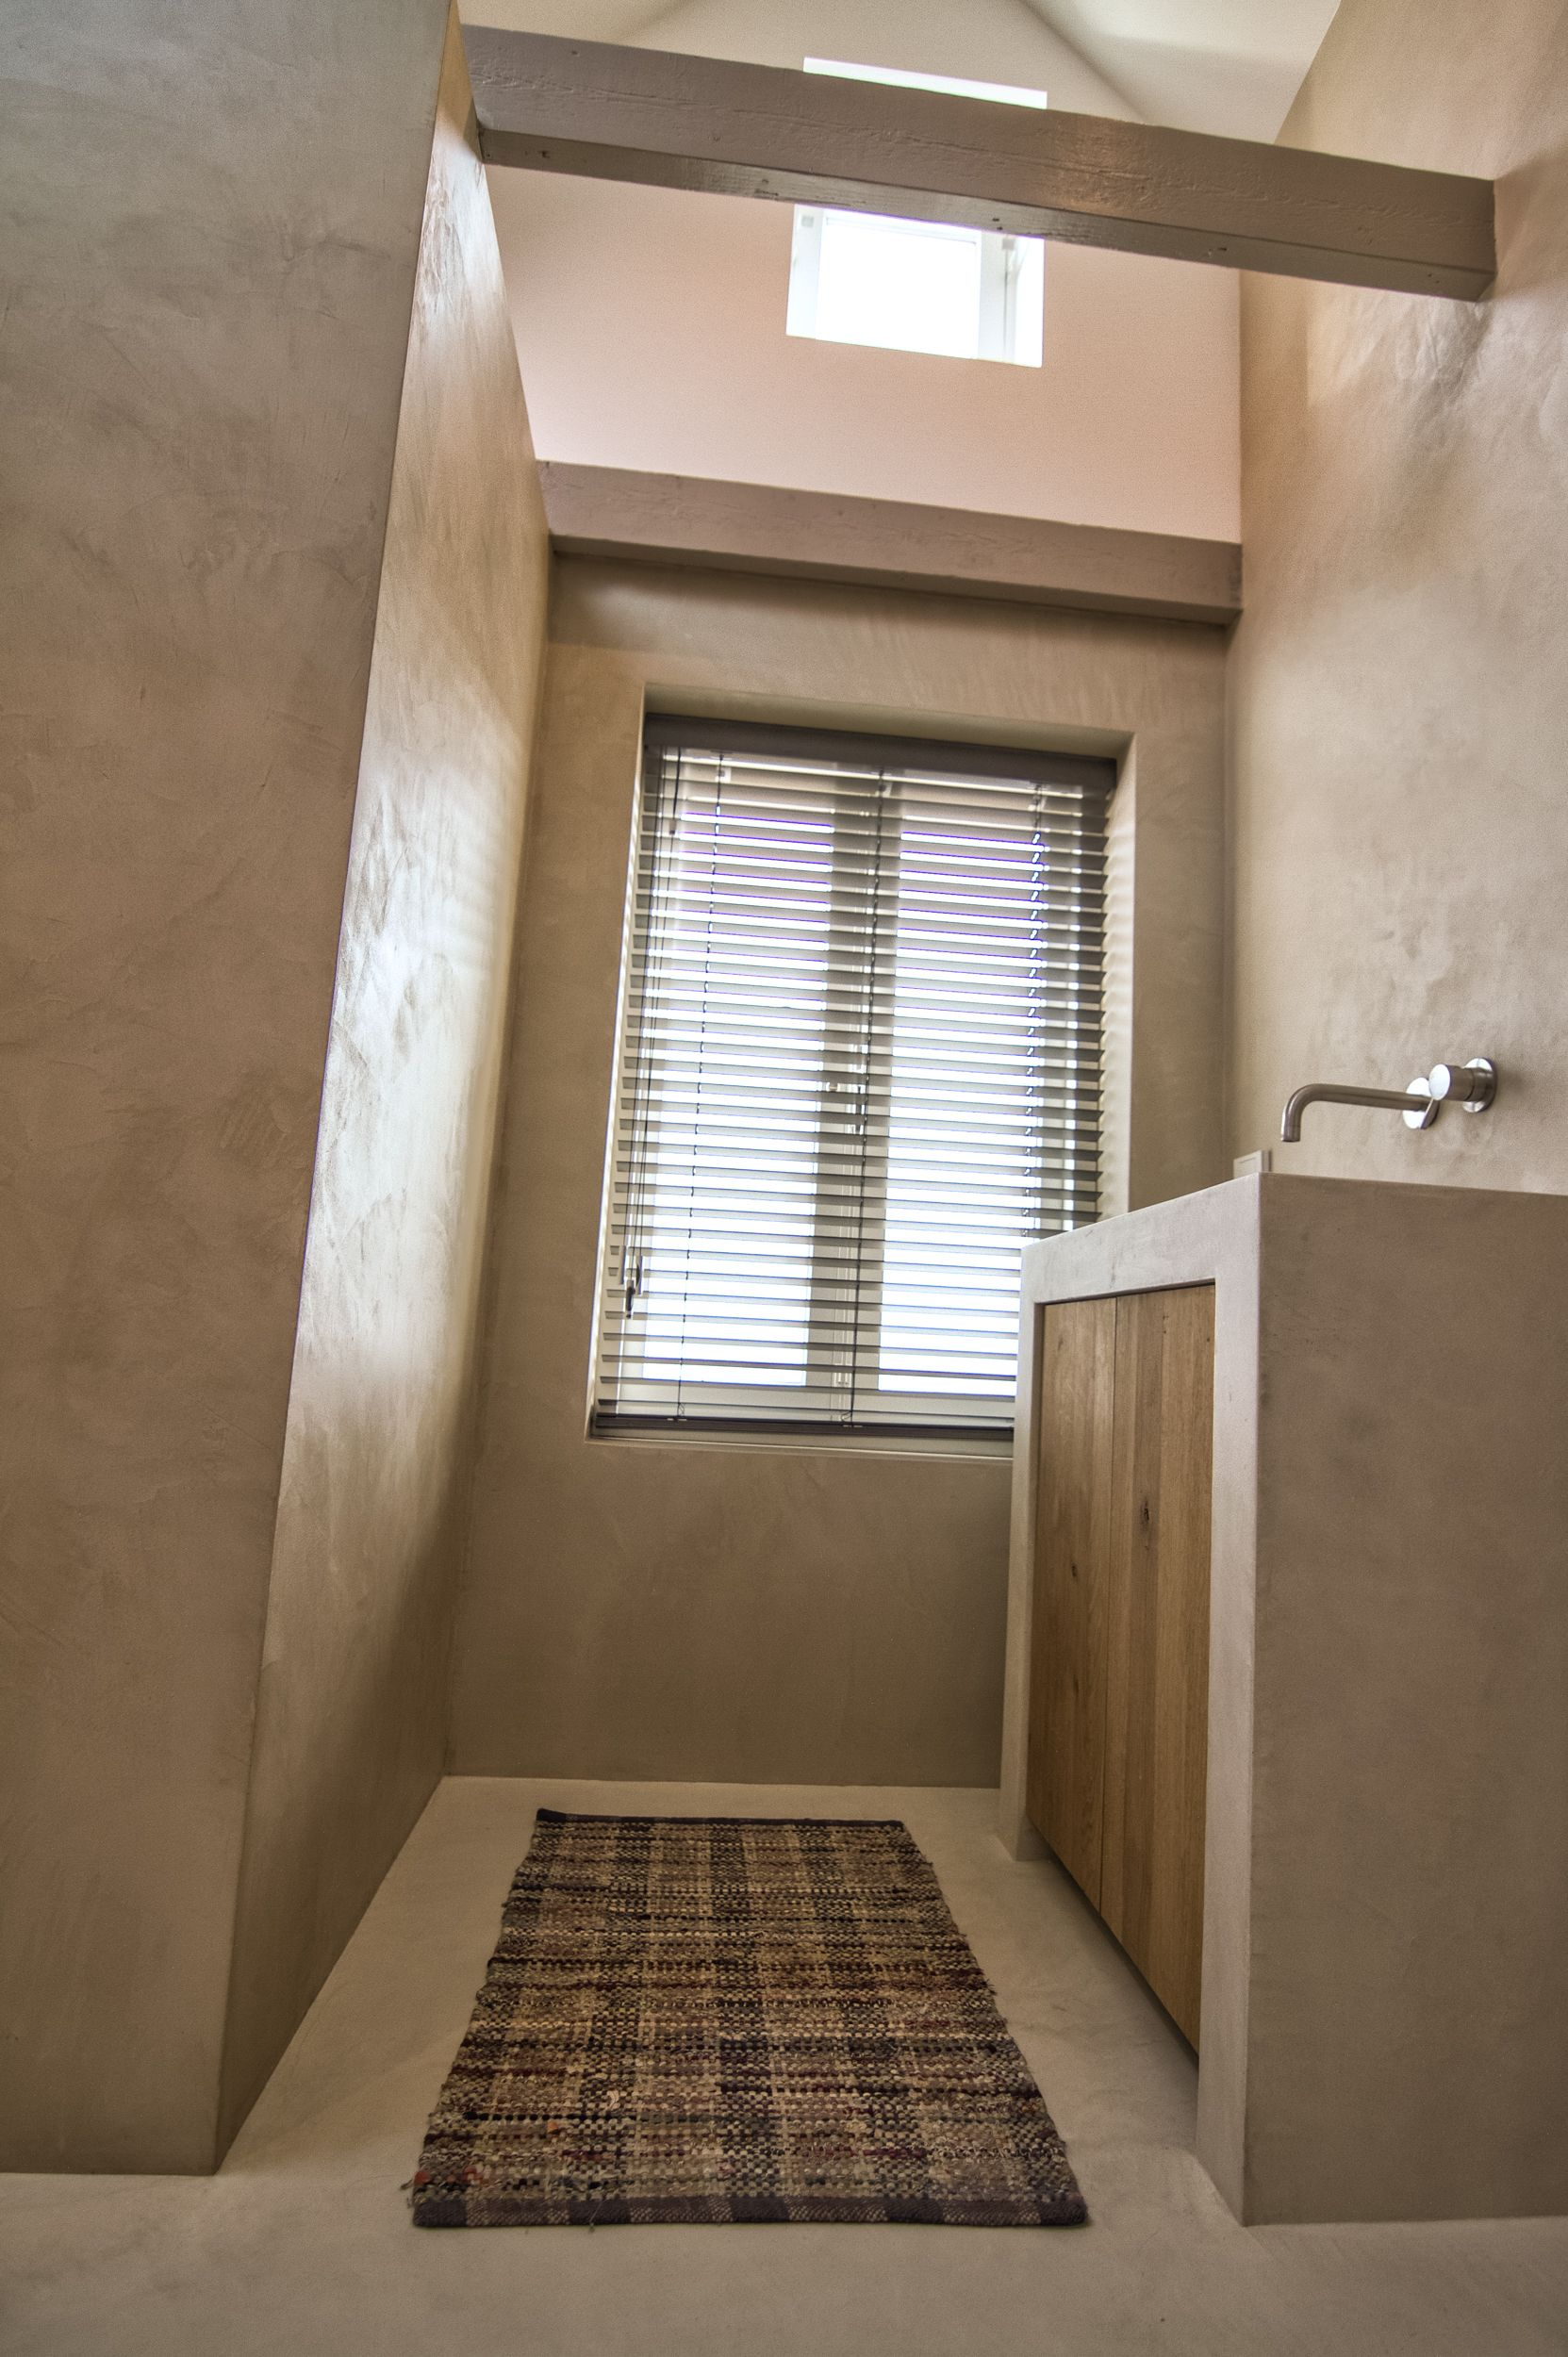 badkamer tendenzadesign beton cire bà ton cirà badkamers